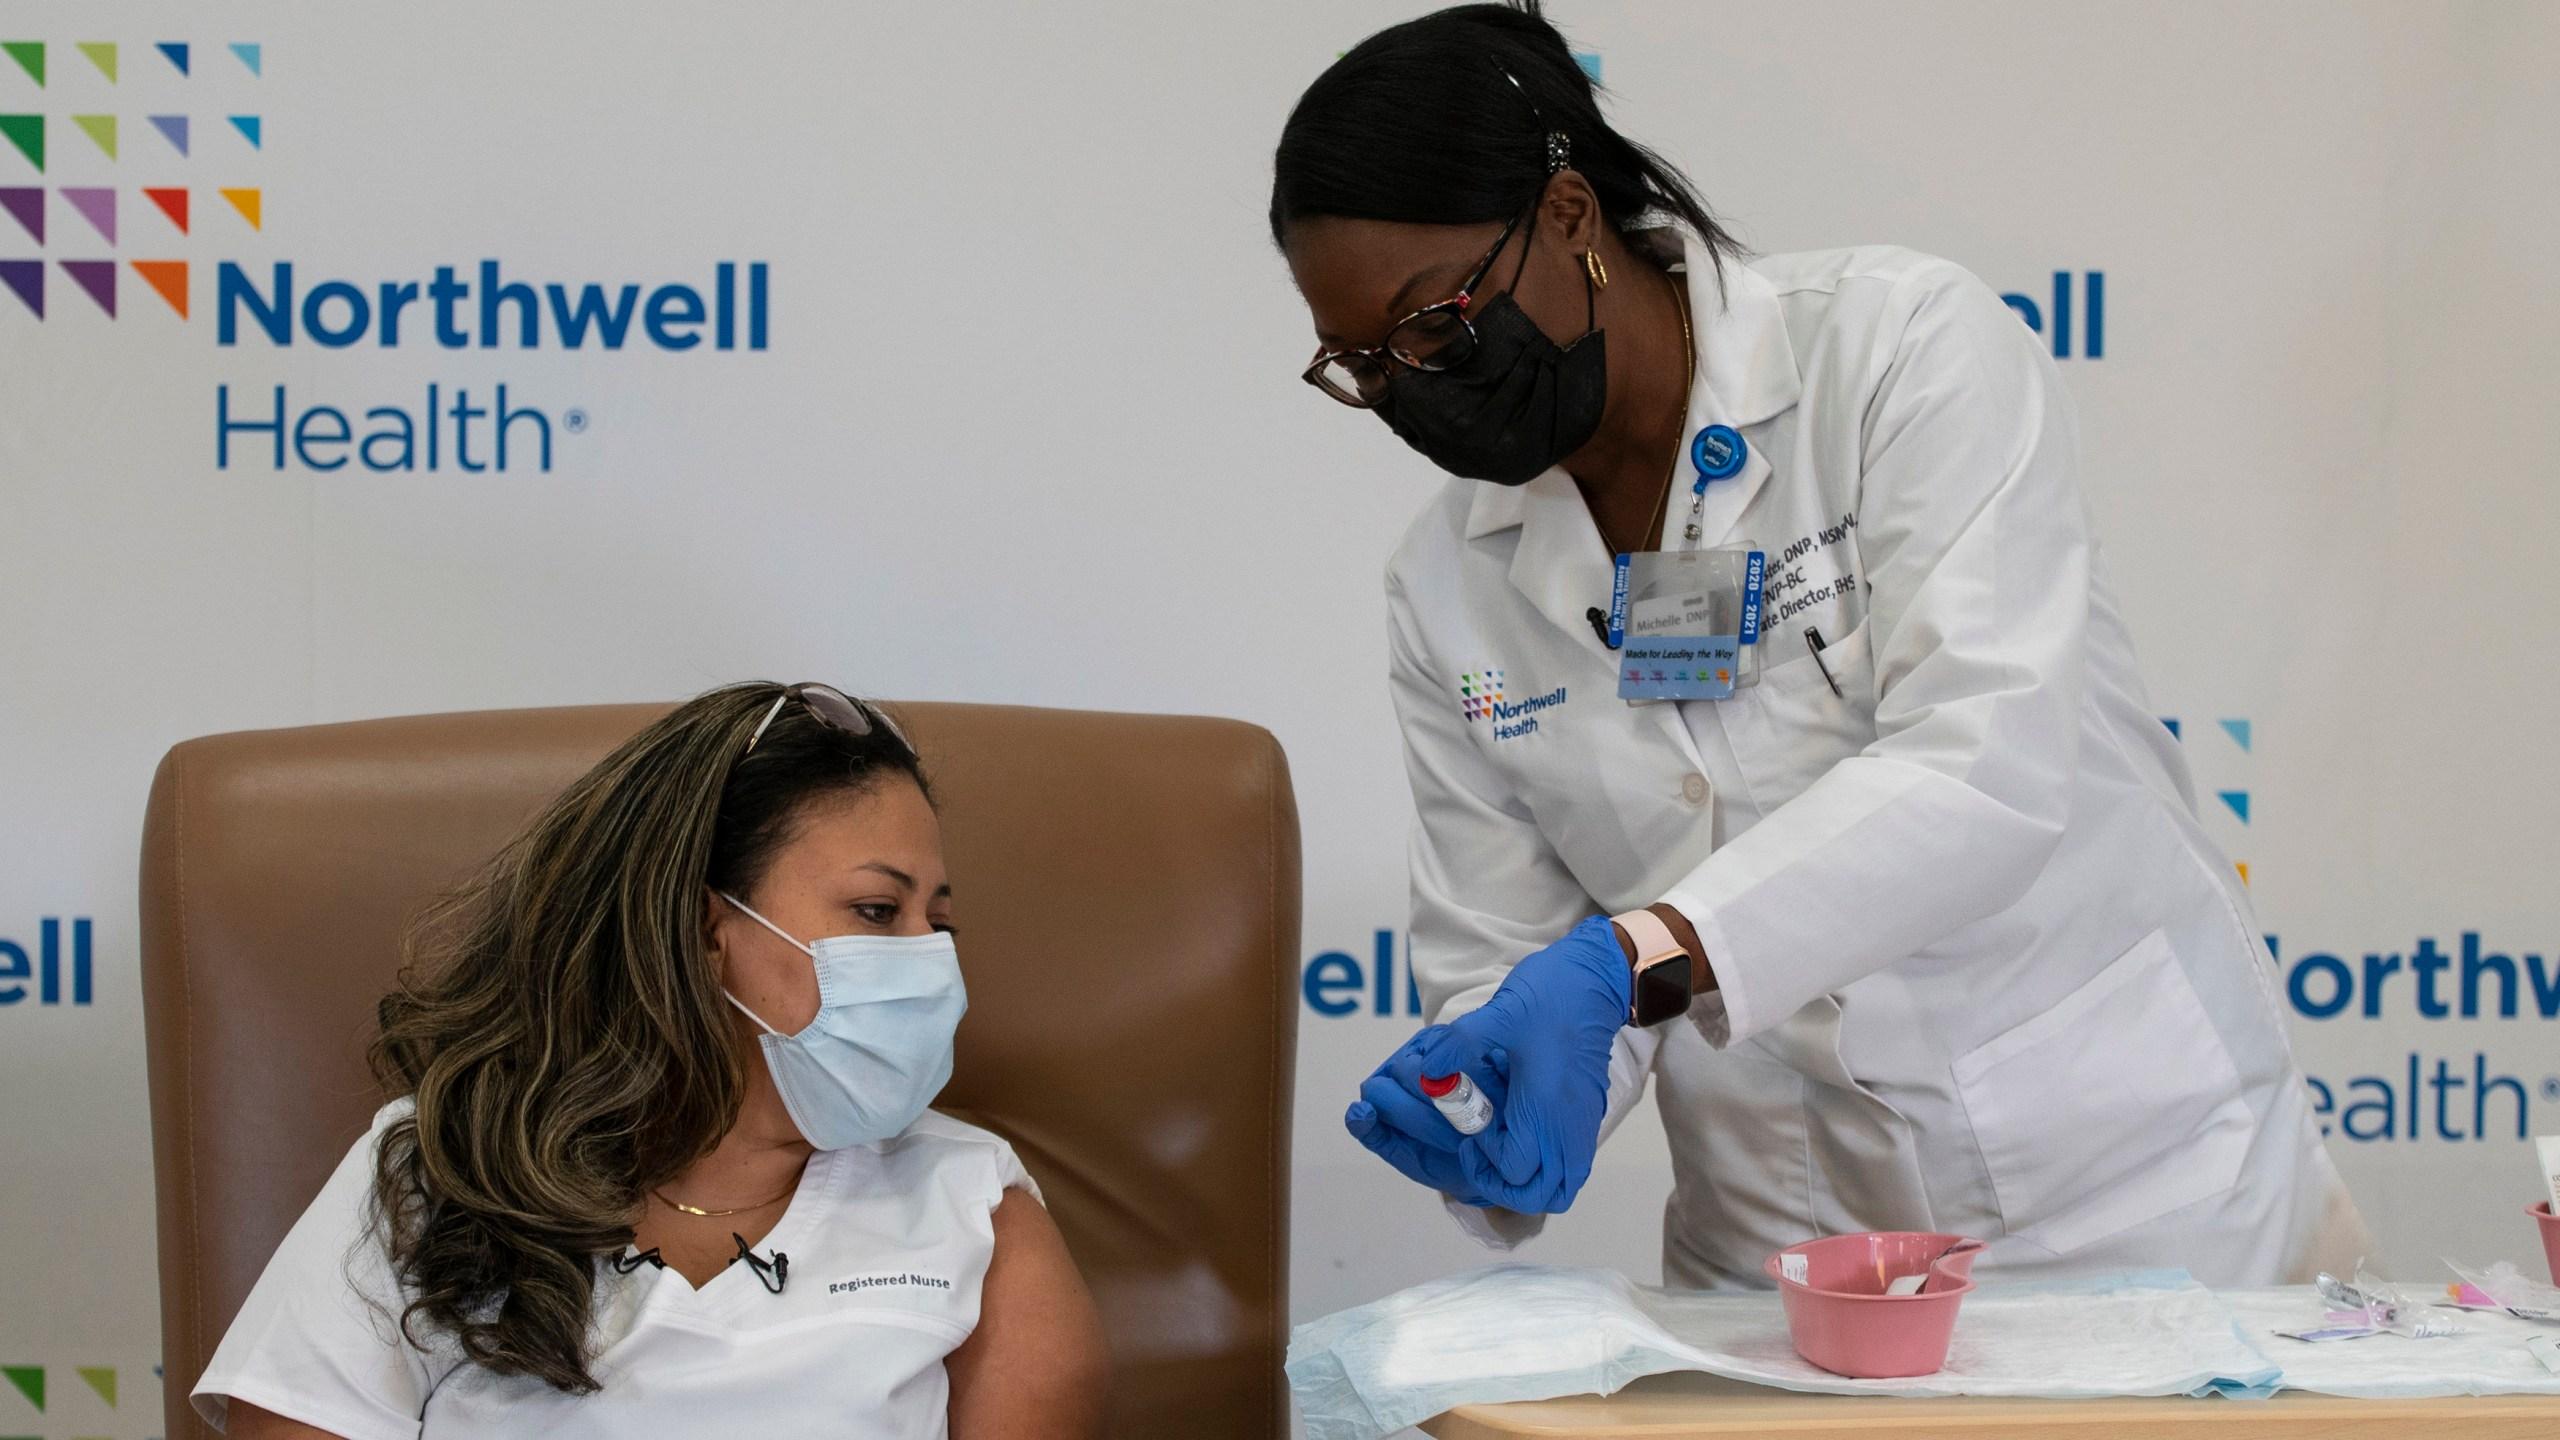 Michelle Chester (R), DNP, director, employee health services, Northwell shows the Moderna coronavirus disease (COVID-19) vaccine to Arlene Ramirez, RN, director, patient care, ED, Long Island Jewish Valley Stream, at Northwell Health's Long Island Jewish Valley Stream hospital in New York City, December 21, 2020. (Photo by Eduardo MUNOZ ALVAREZ / POOL / AFP) (Photo by EDUARDO MUNOZ ALVAREZ/POOL/AFP via Getty Images)